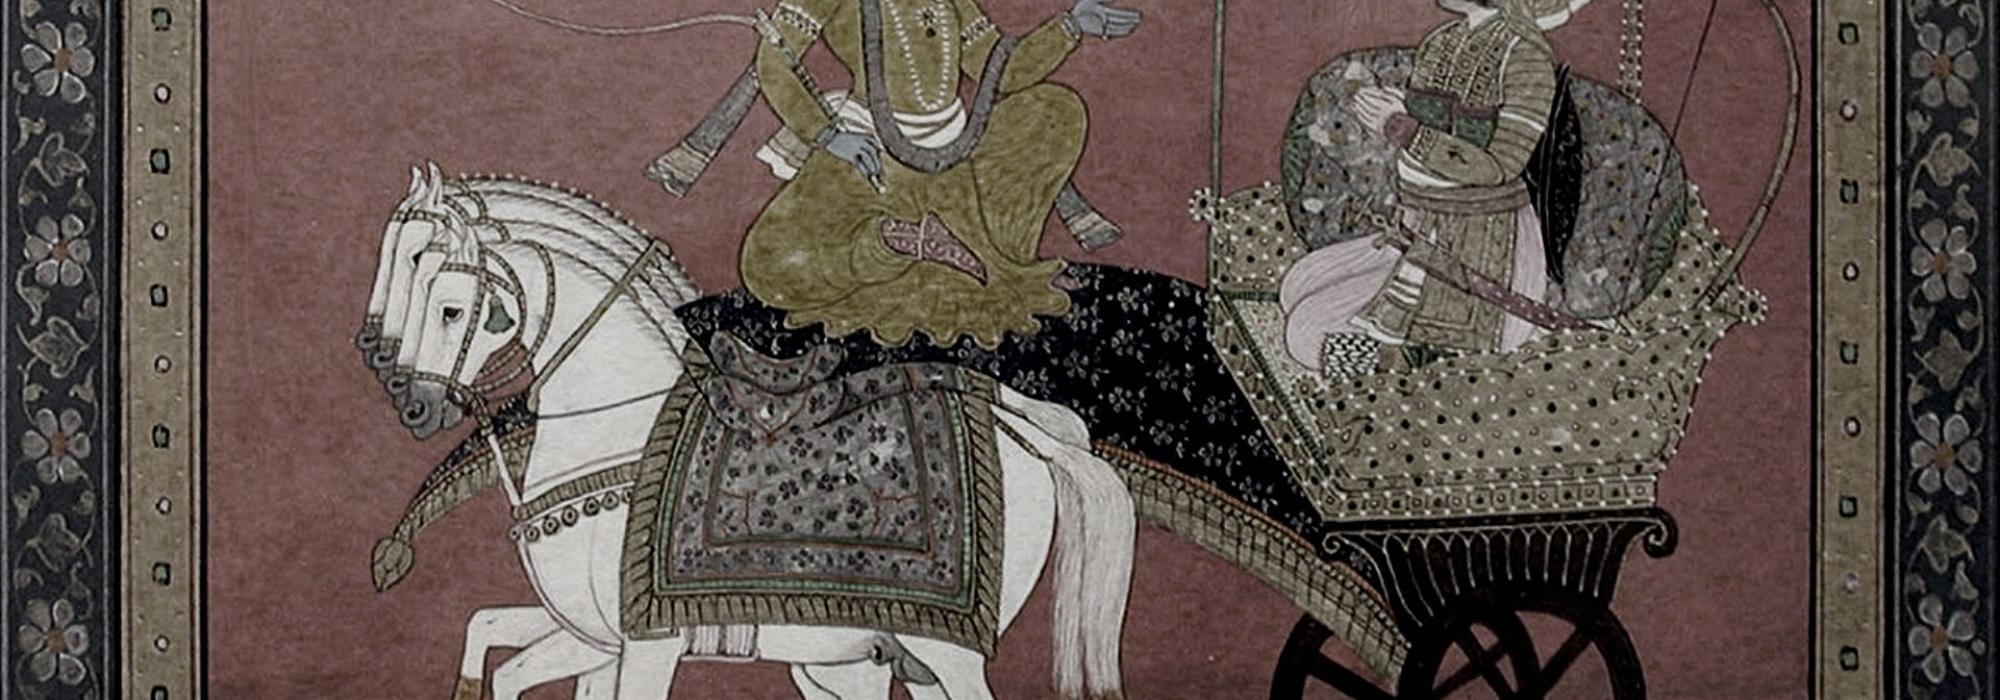 The Singularity of the Bhagavad Gita: Introduction | Prekshaa